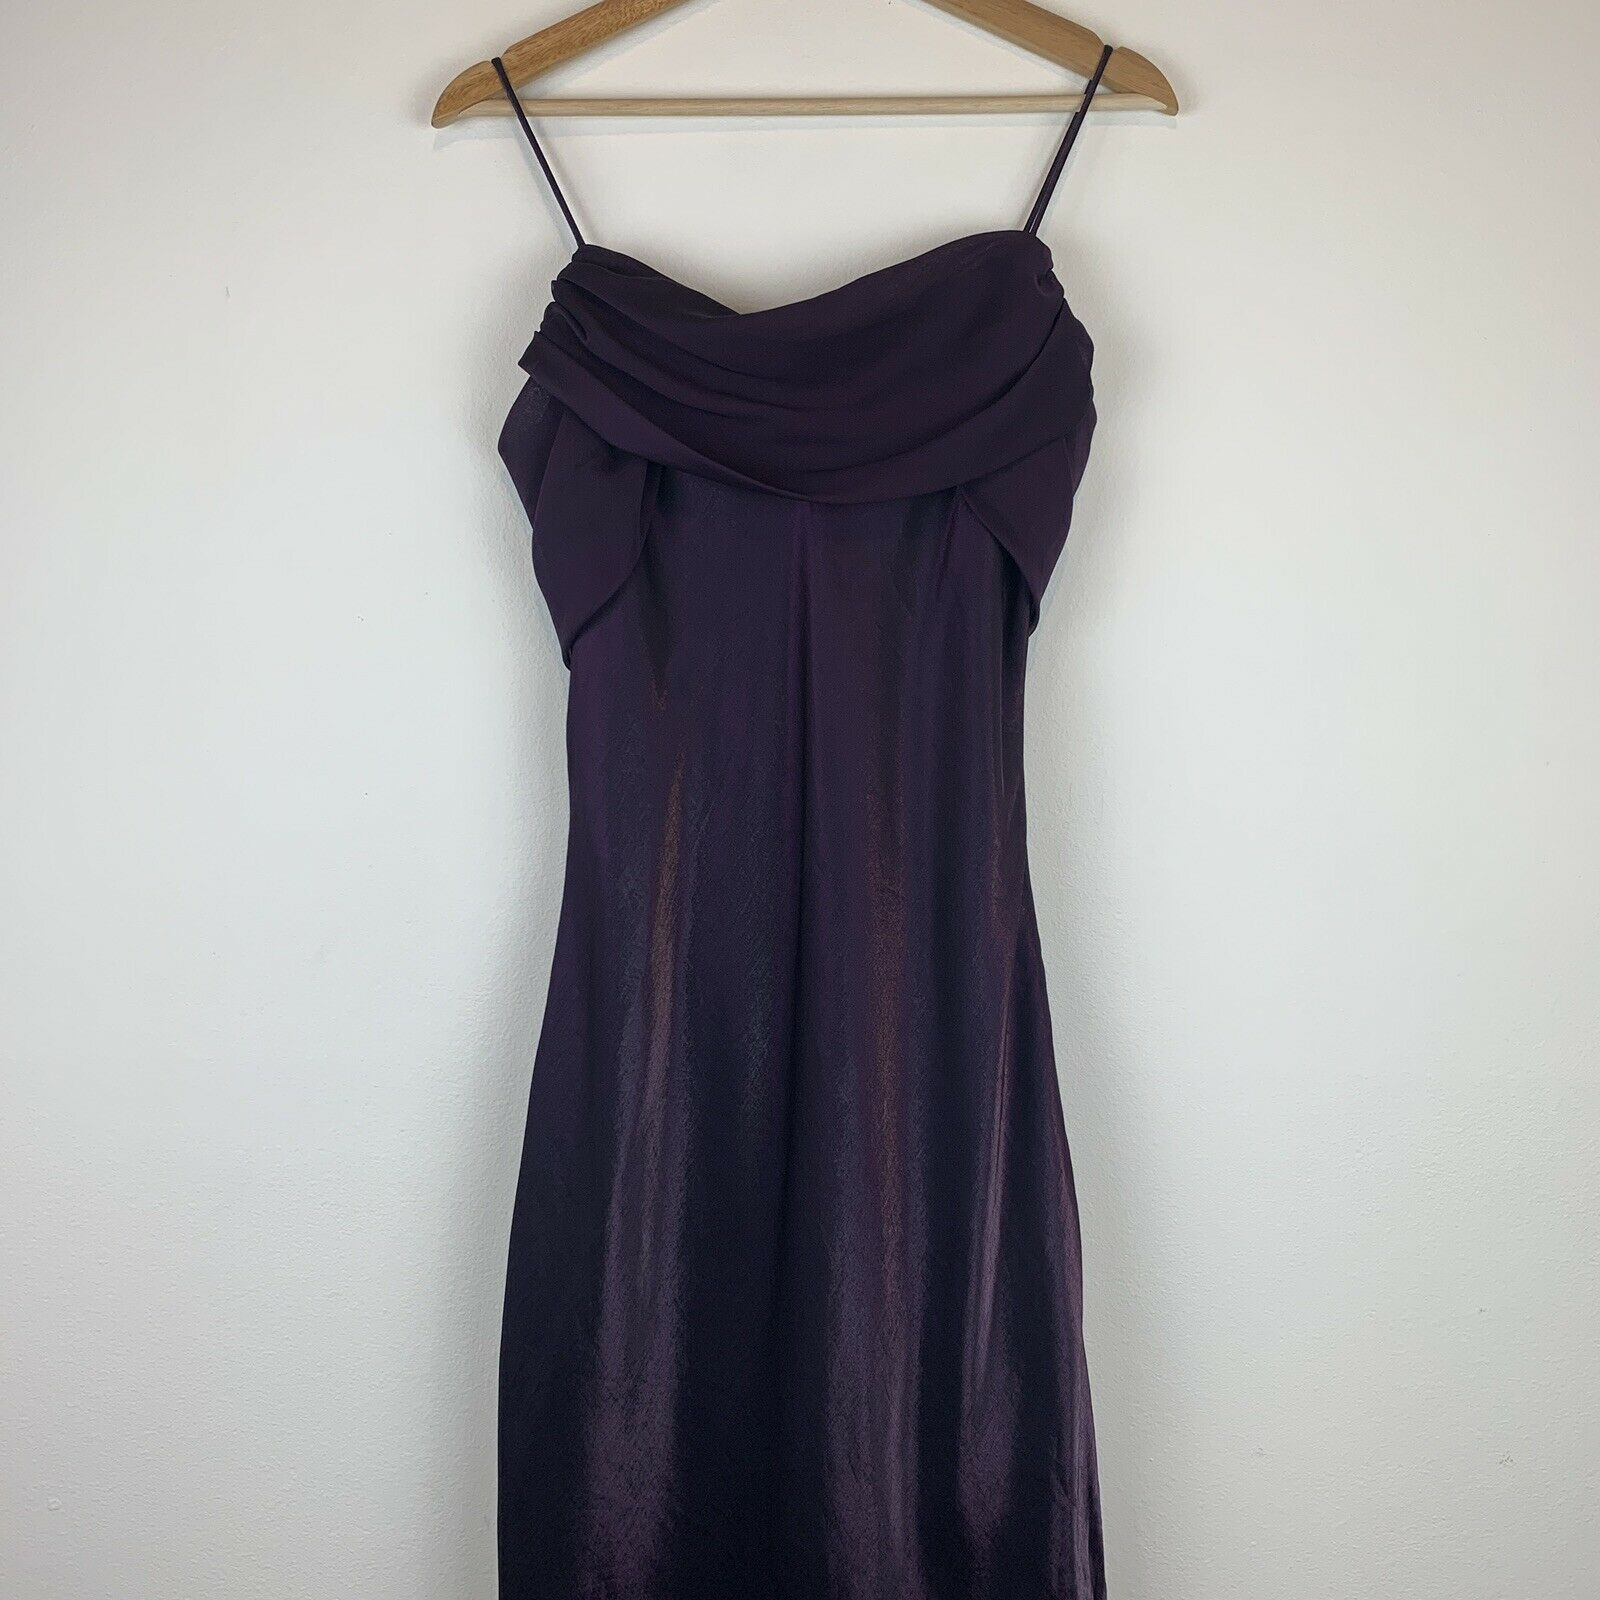 Betsy & Adam Women's Prom Formal Maxi Dress Spaghetti Straps Shiny Purple Sz M